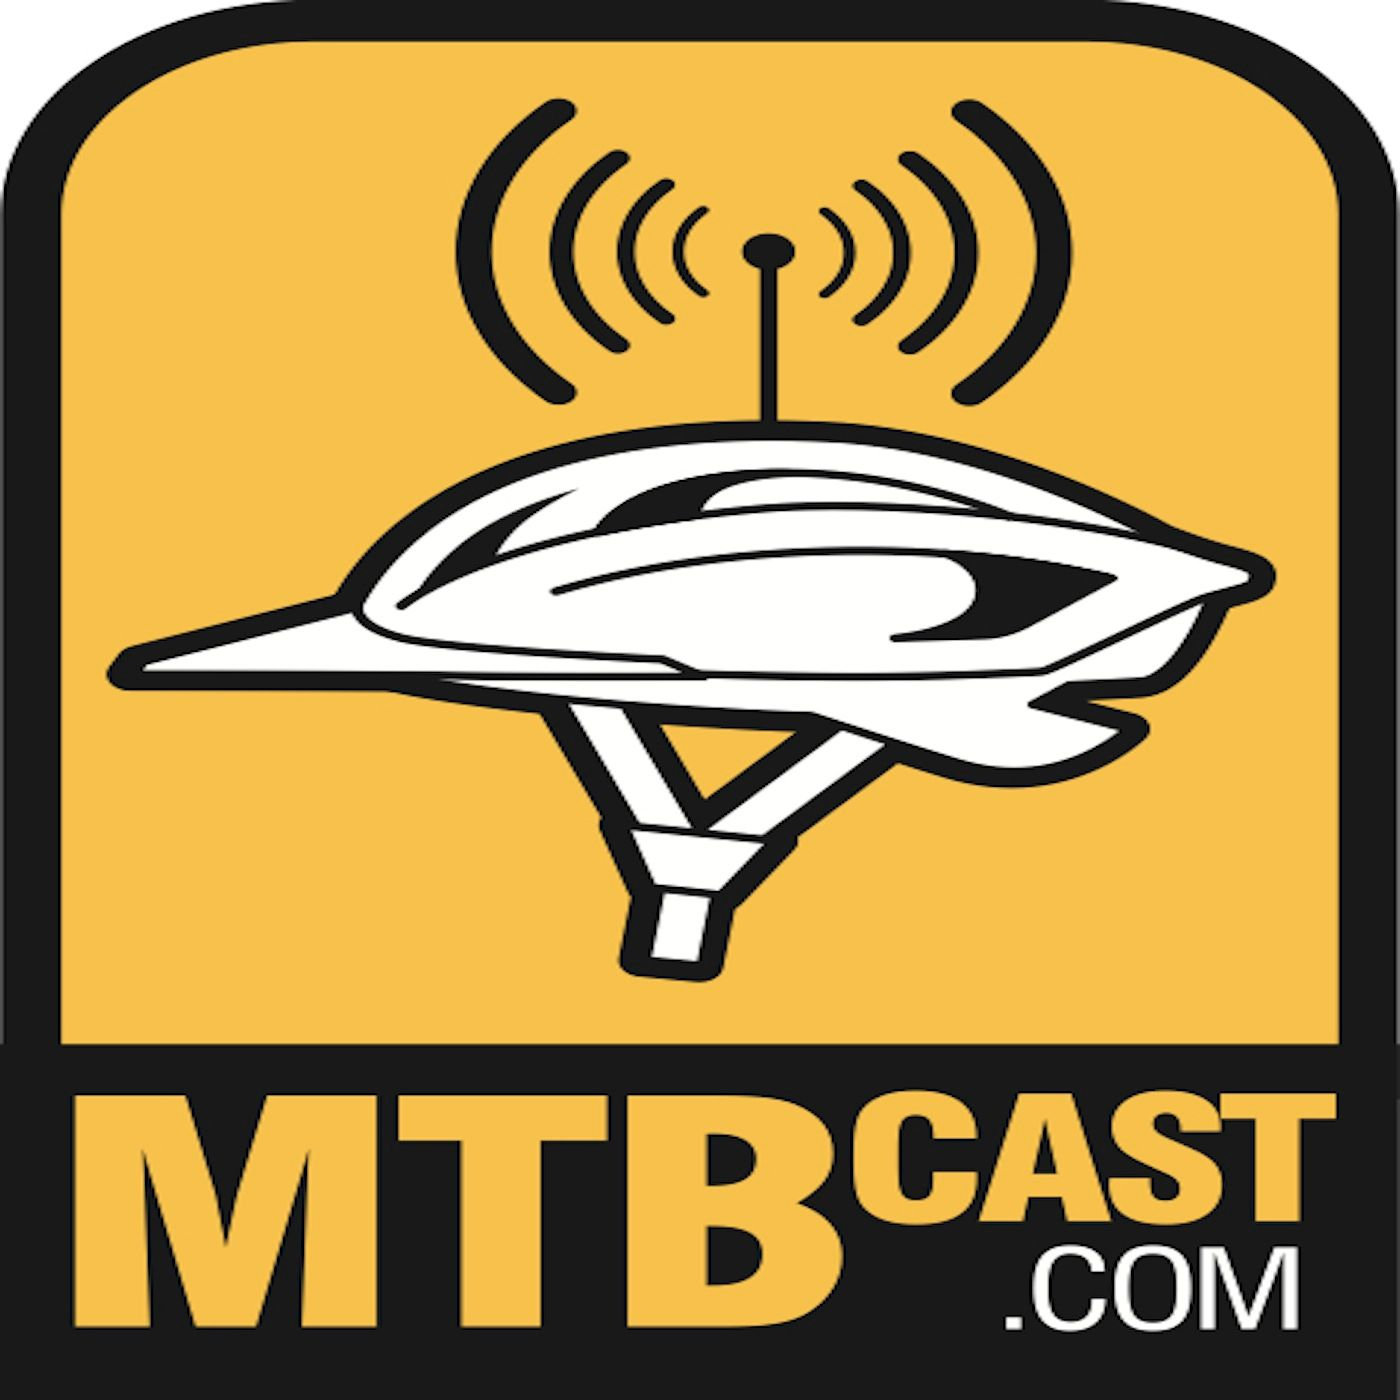 MTBCast: Tour Divide '19 – Days 8-11 TrueUp!